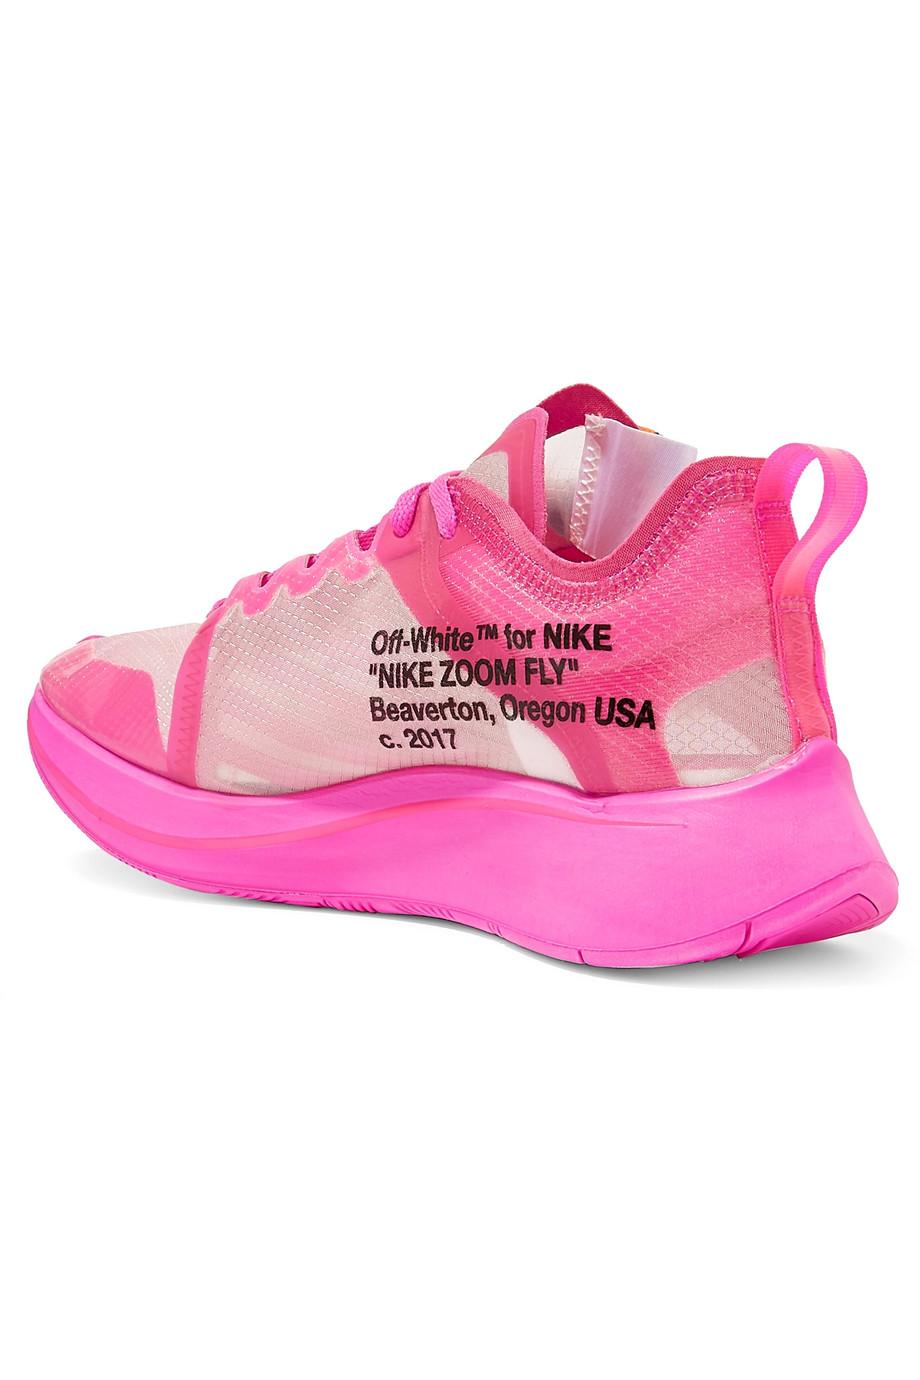 nike off white pink.jpg